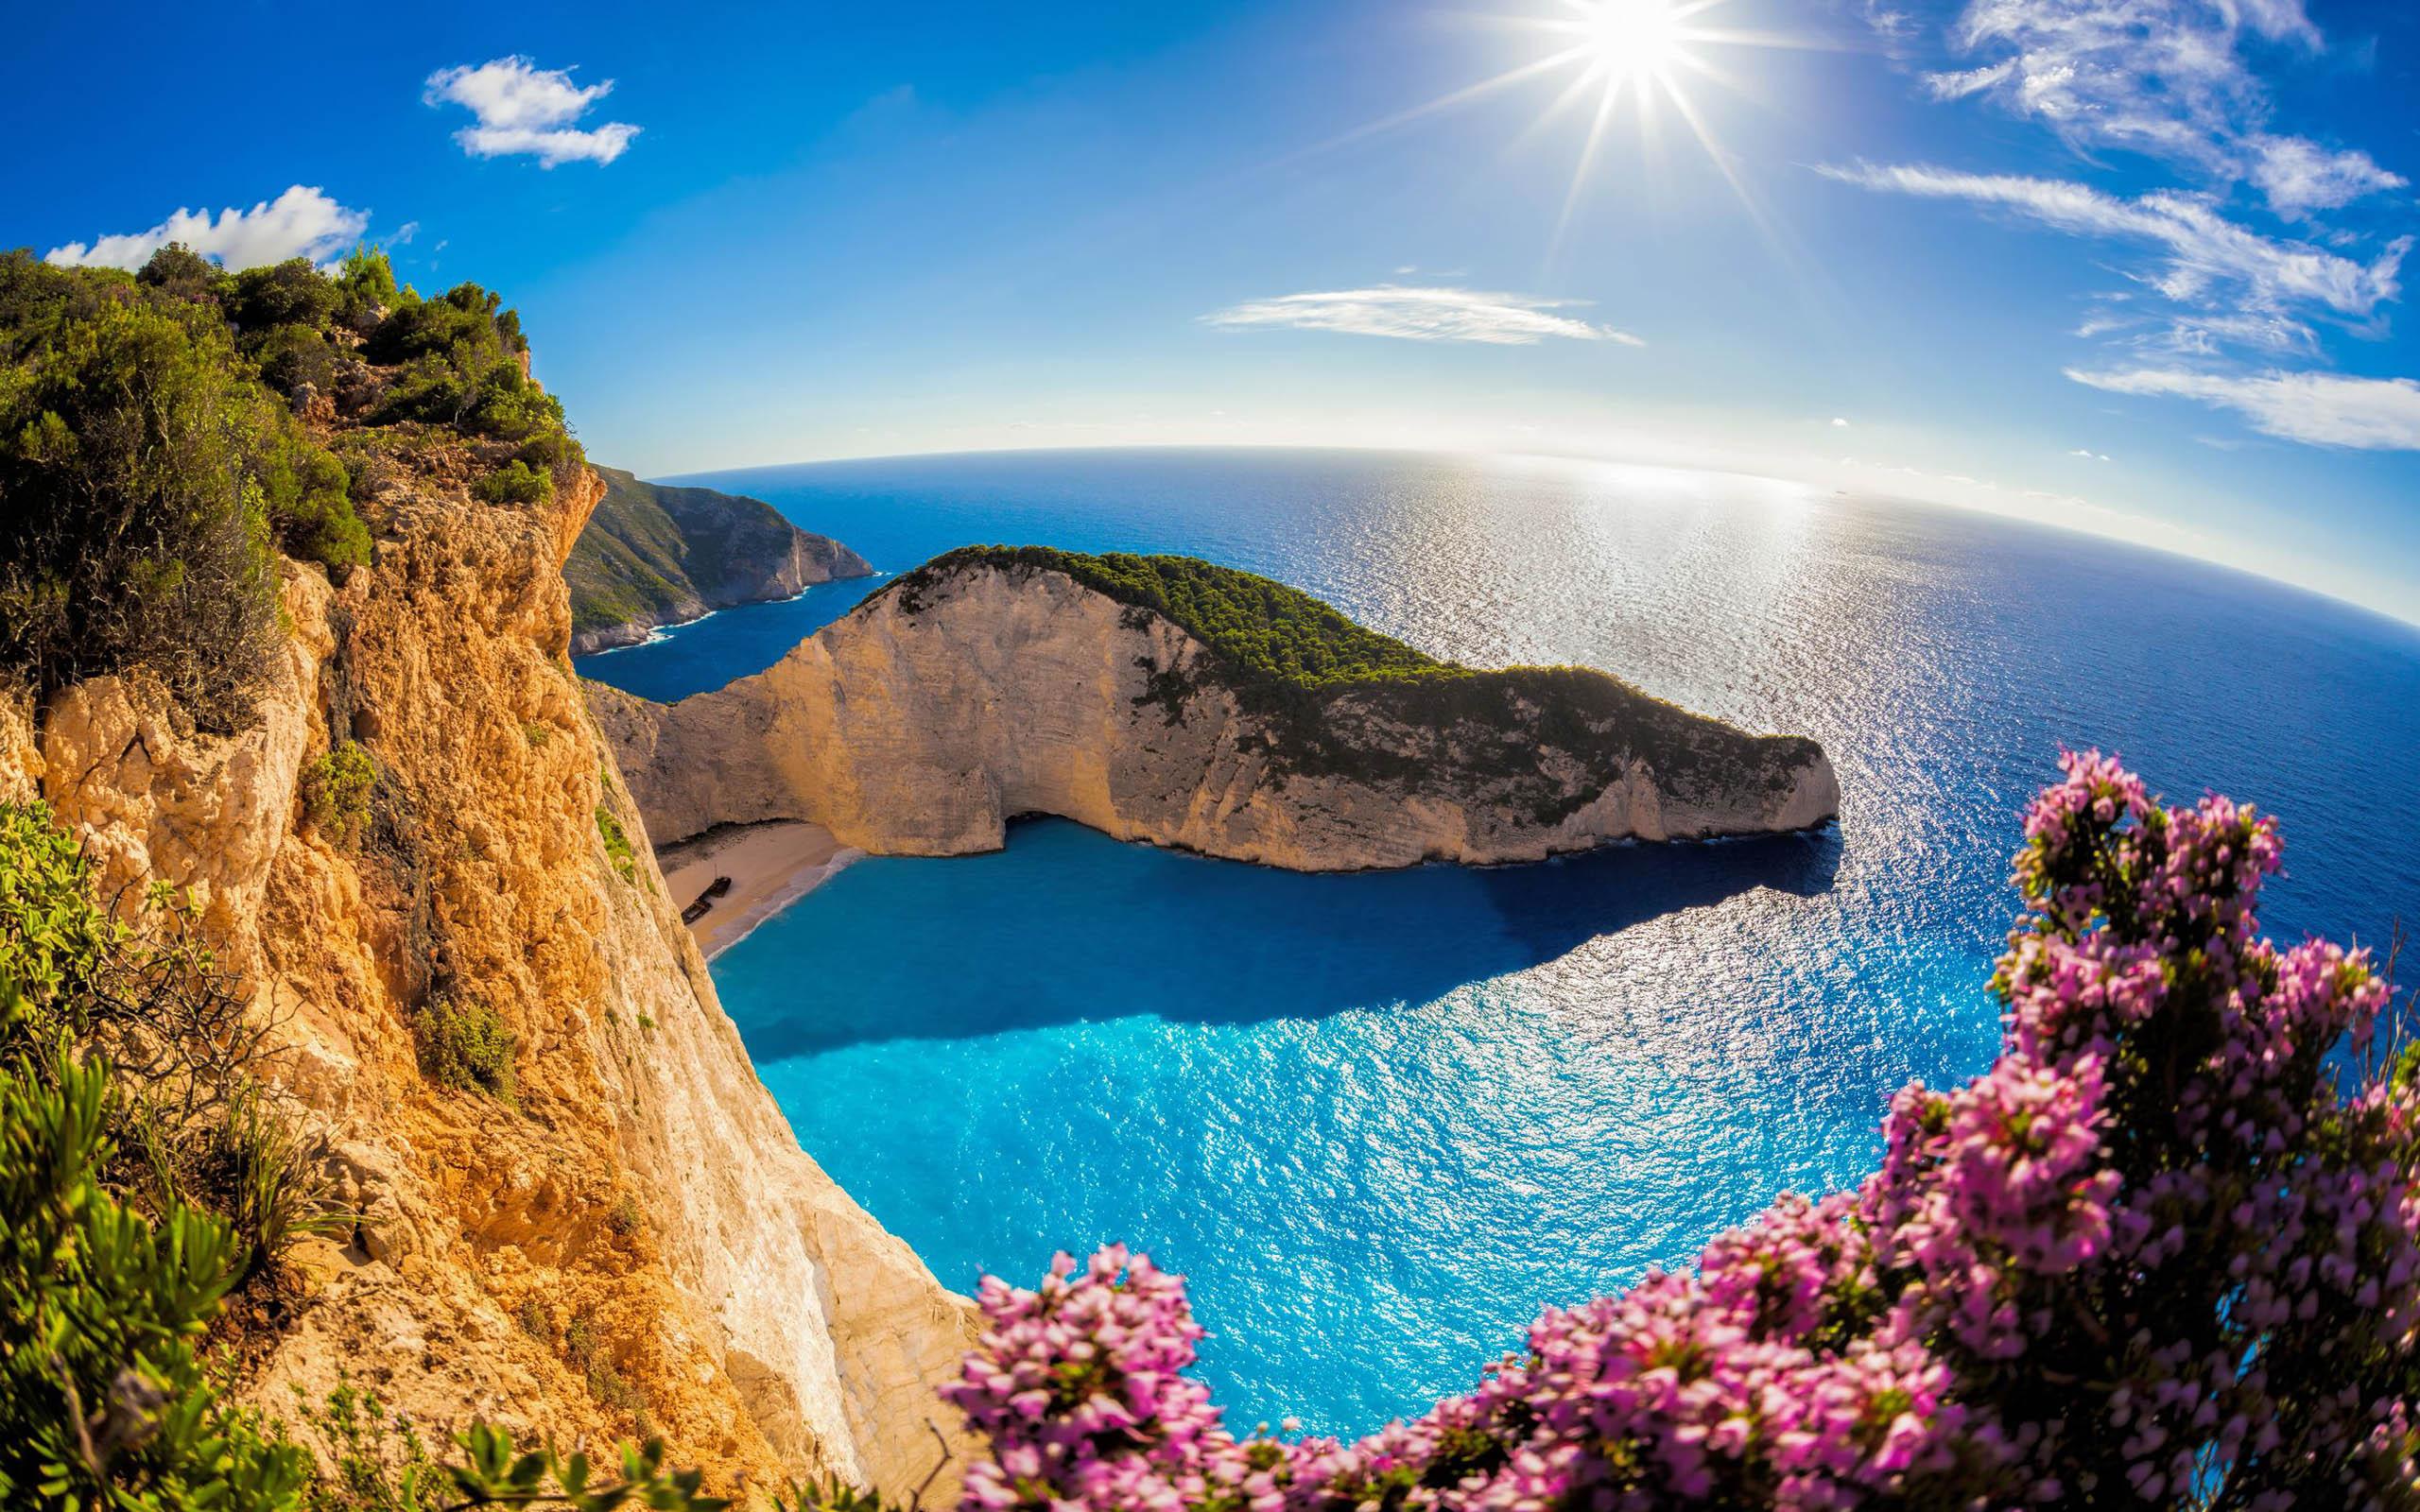 Download wallpapers Zakynthos summer bay paradise sea cliffs 2560x1600